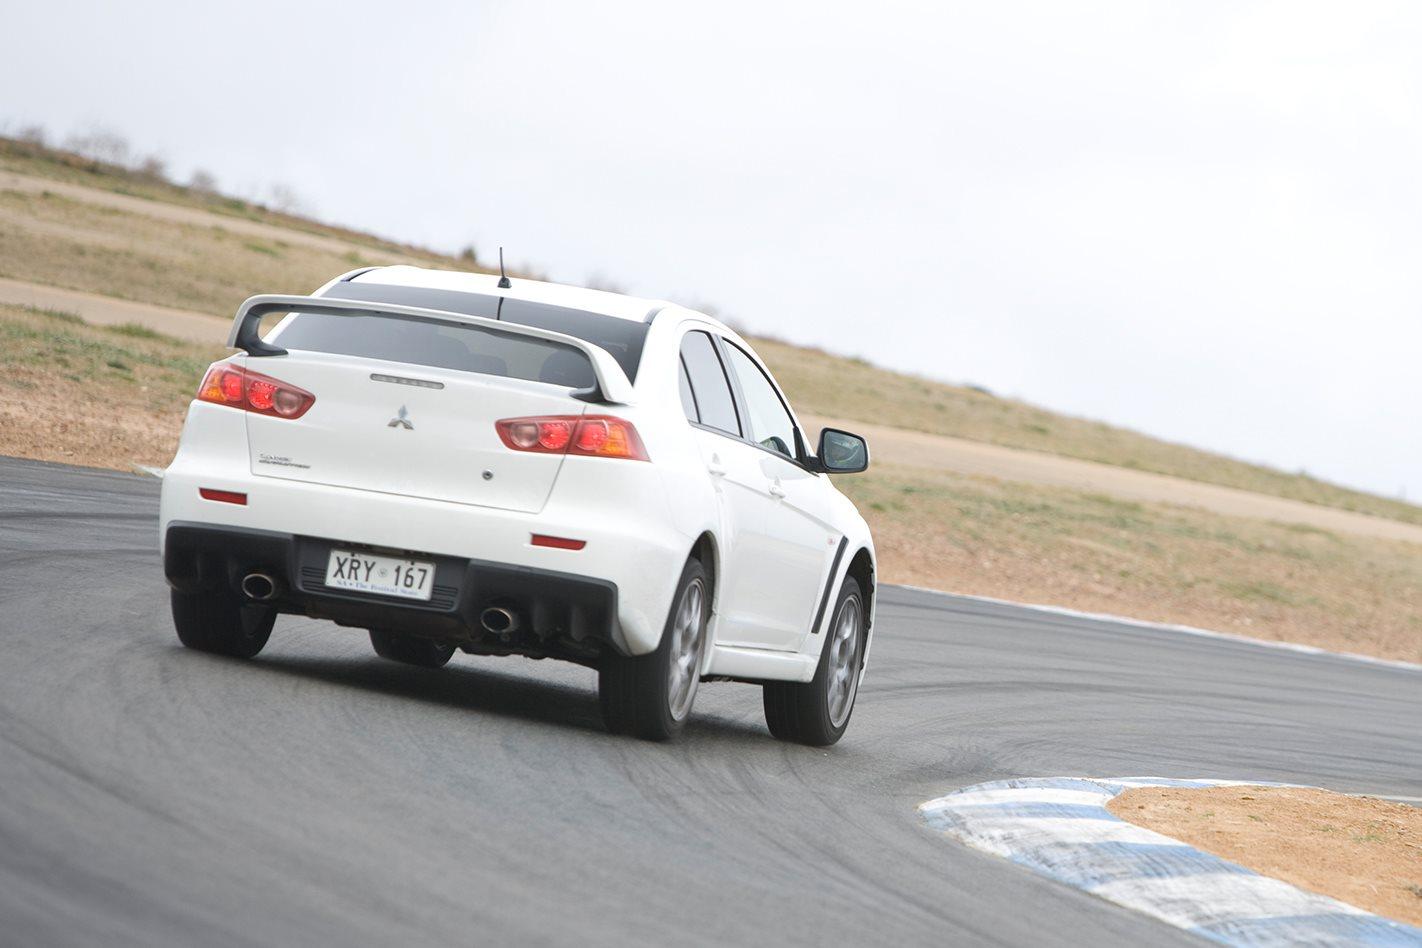 2008-Mitsubishi-Lancer-Evo-X-rear.jpg